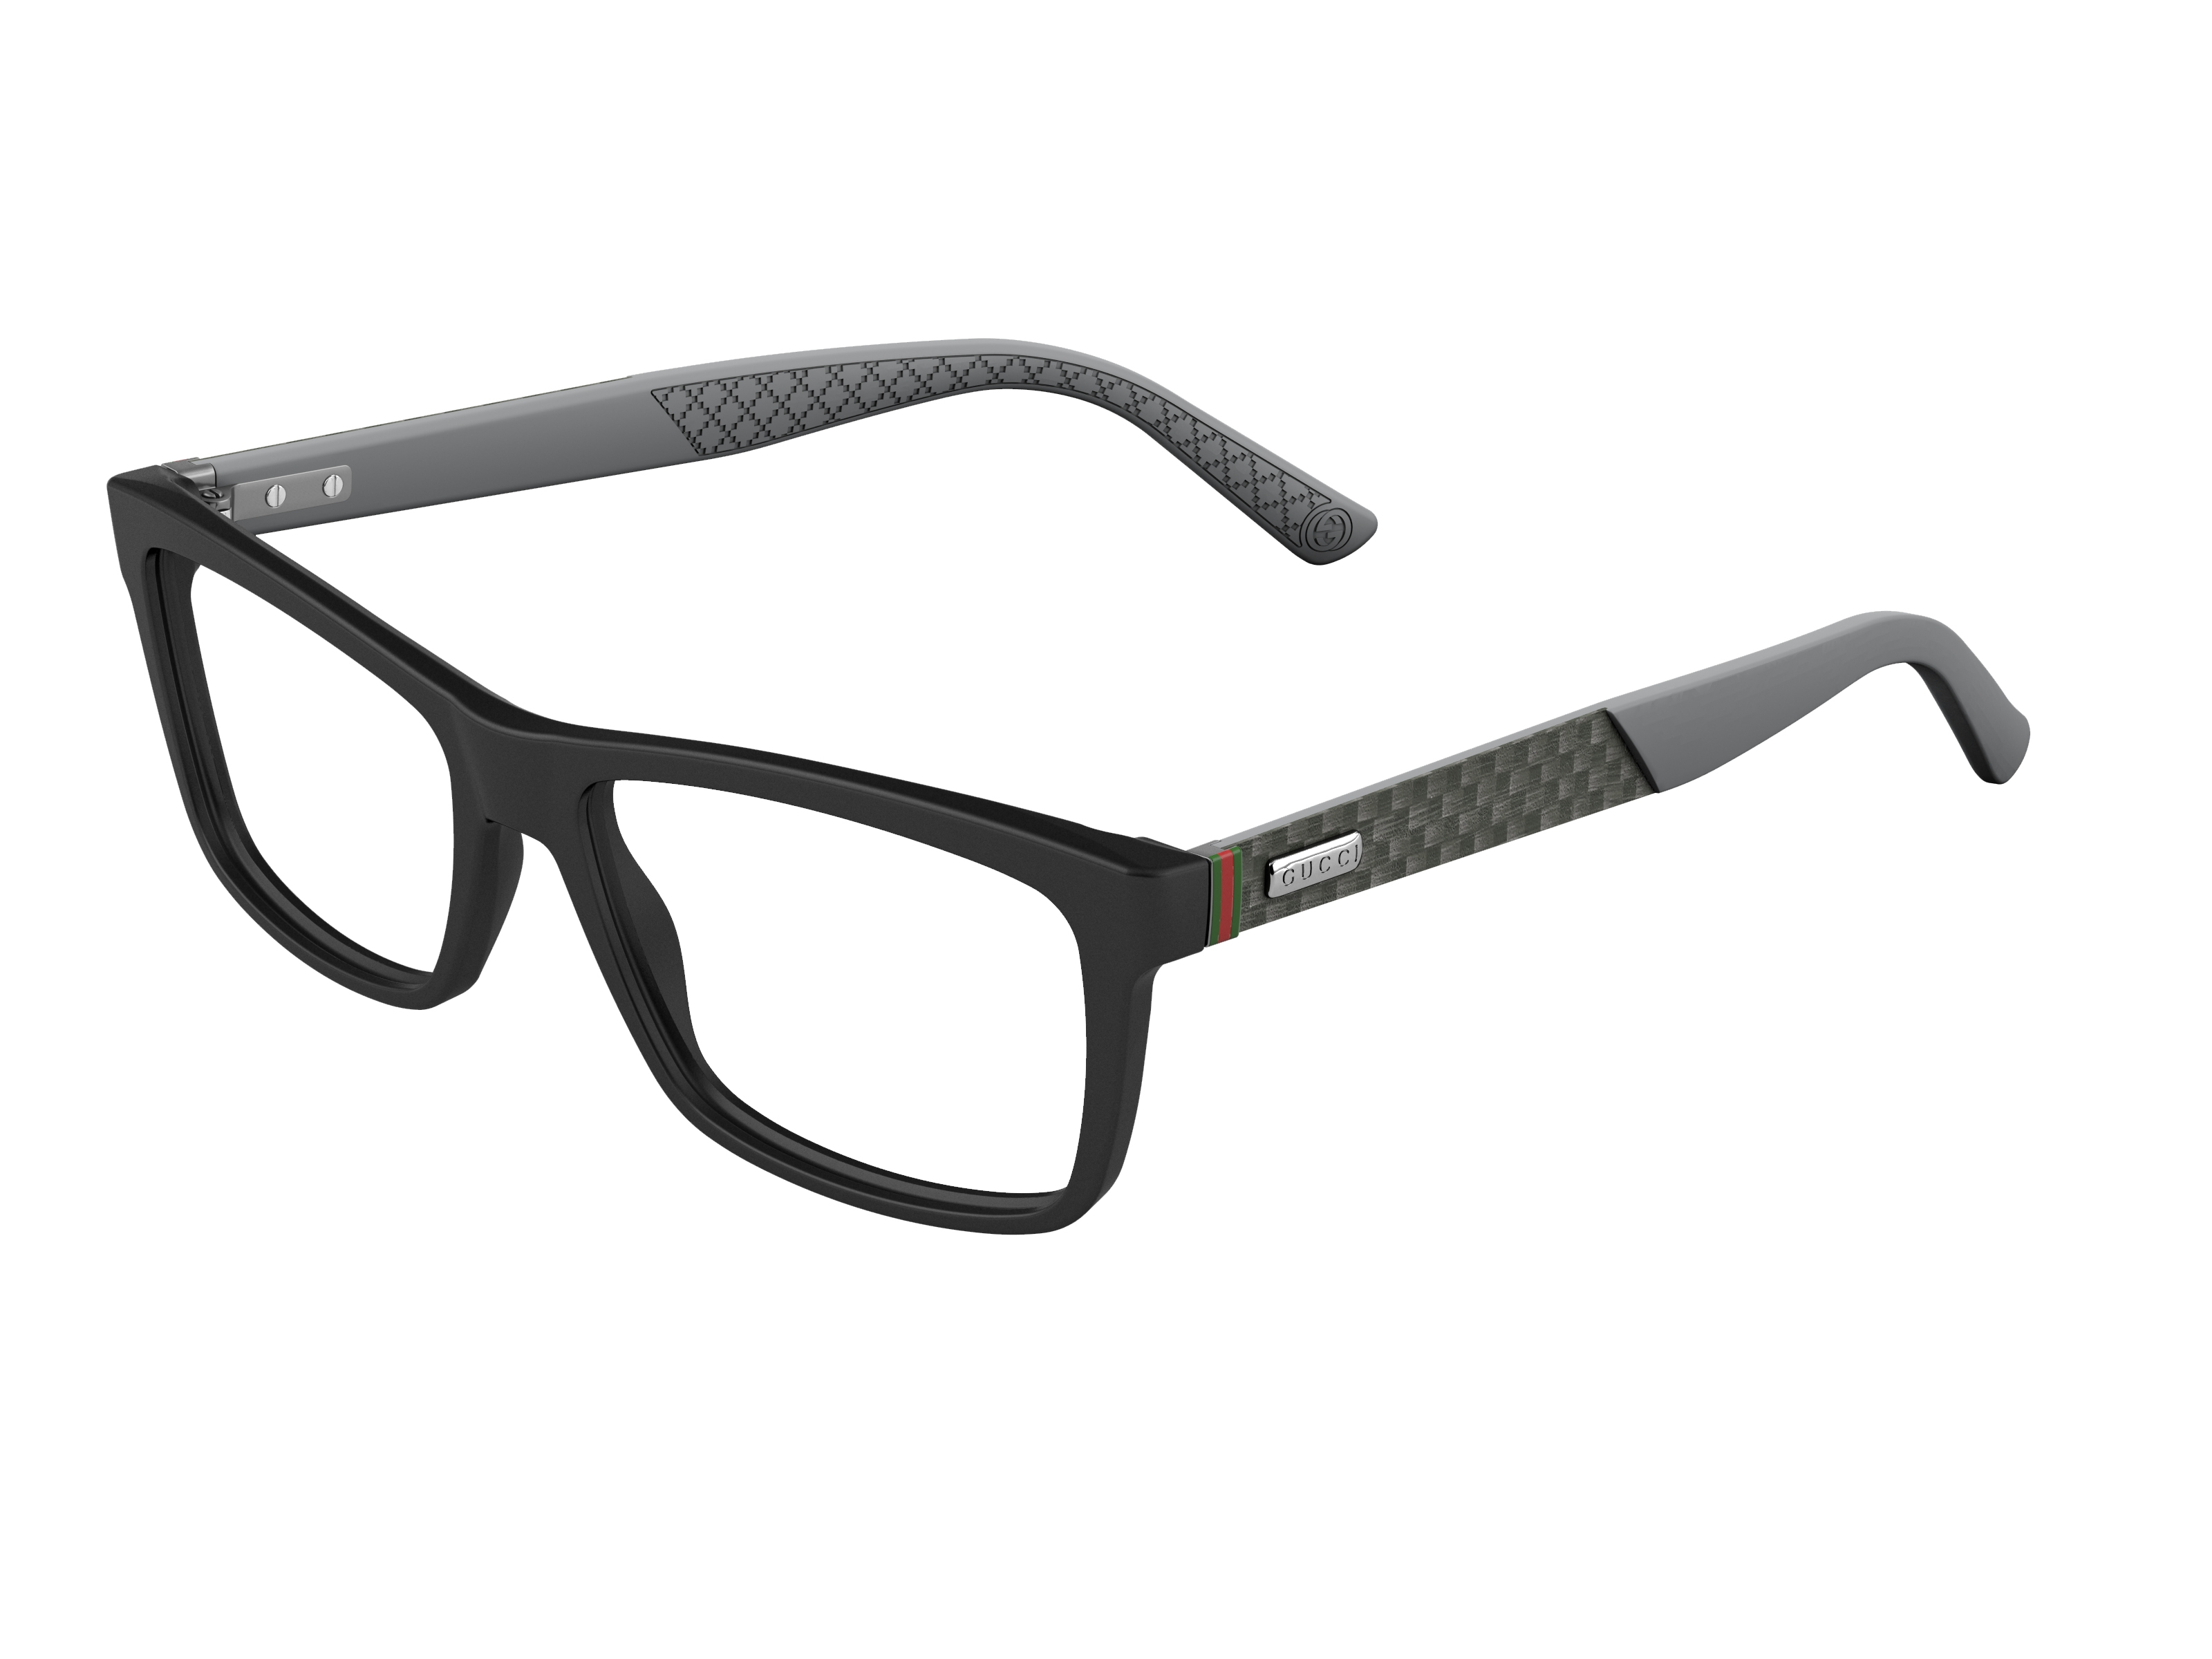 Gucci  νέα γυαλιά ηλίου   οράσεως για άντρες  011dad1c609